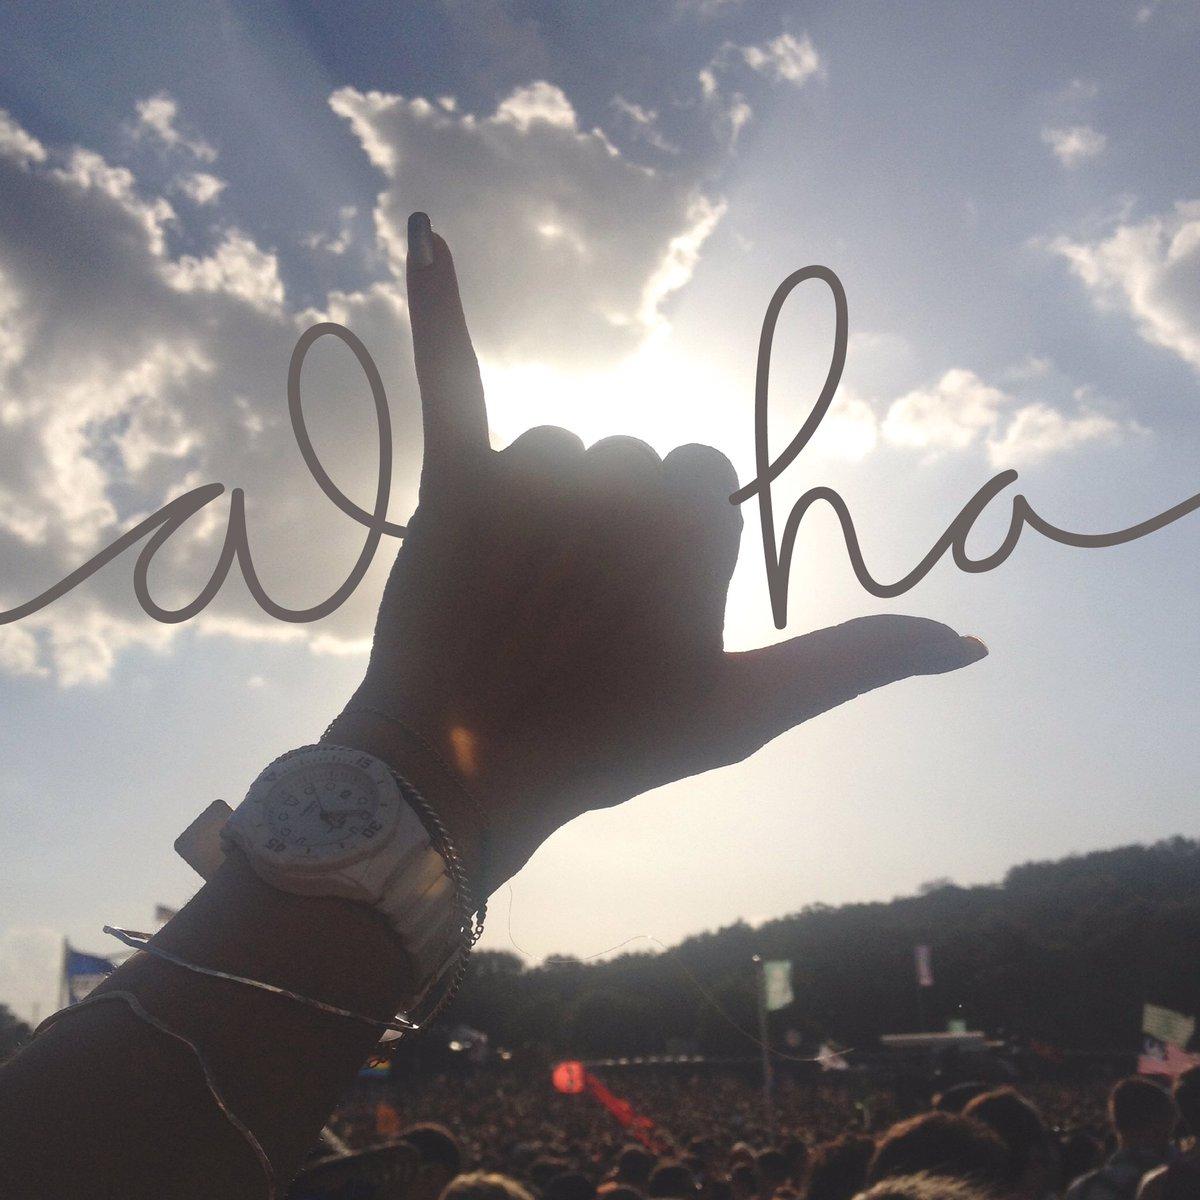 Aloha Happy Friday! #MakeAGoodMorningGREAT <br>http://pic.twitter.com/94Dl2cbEUw